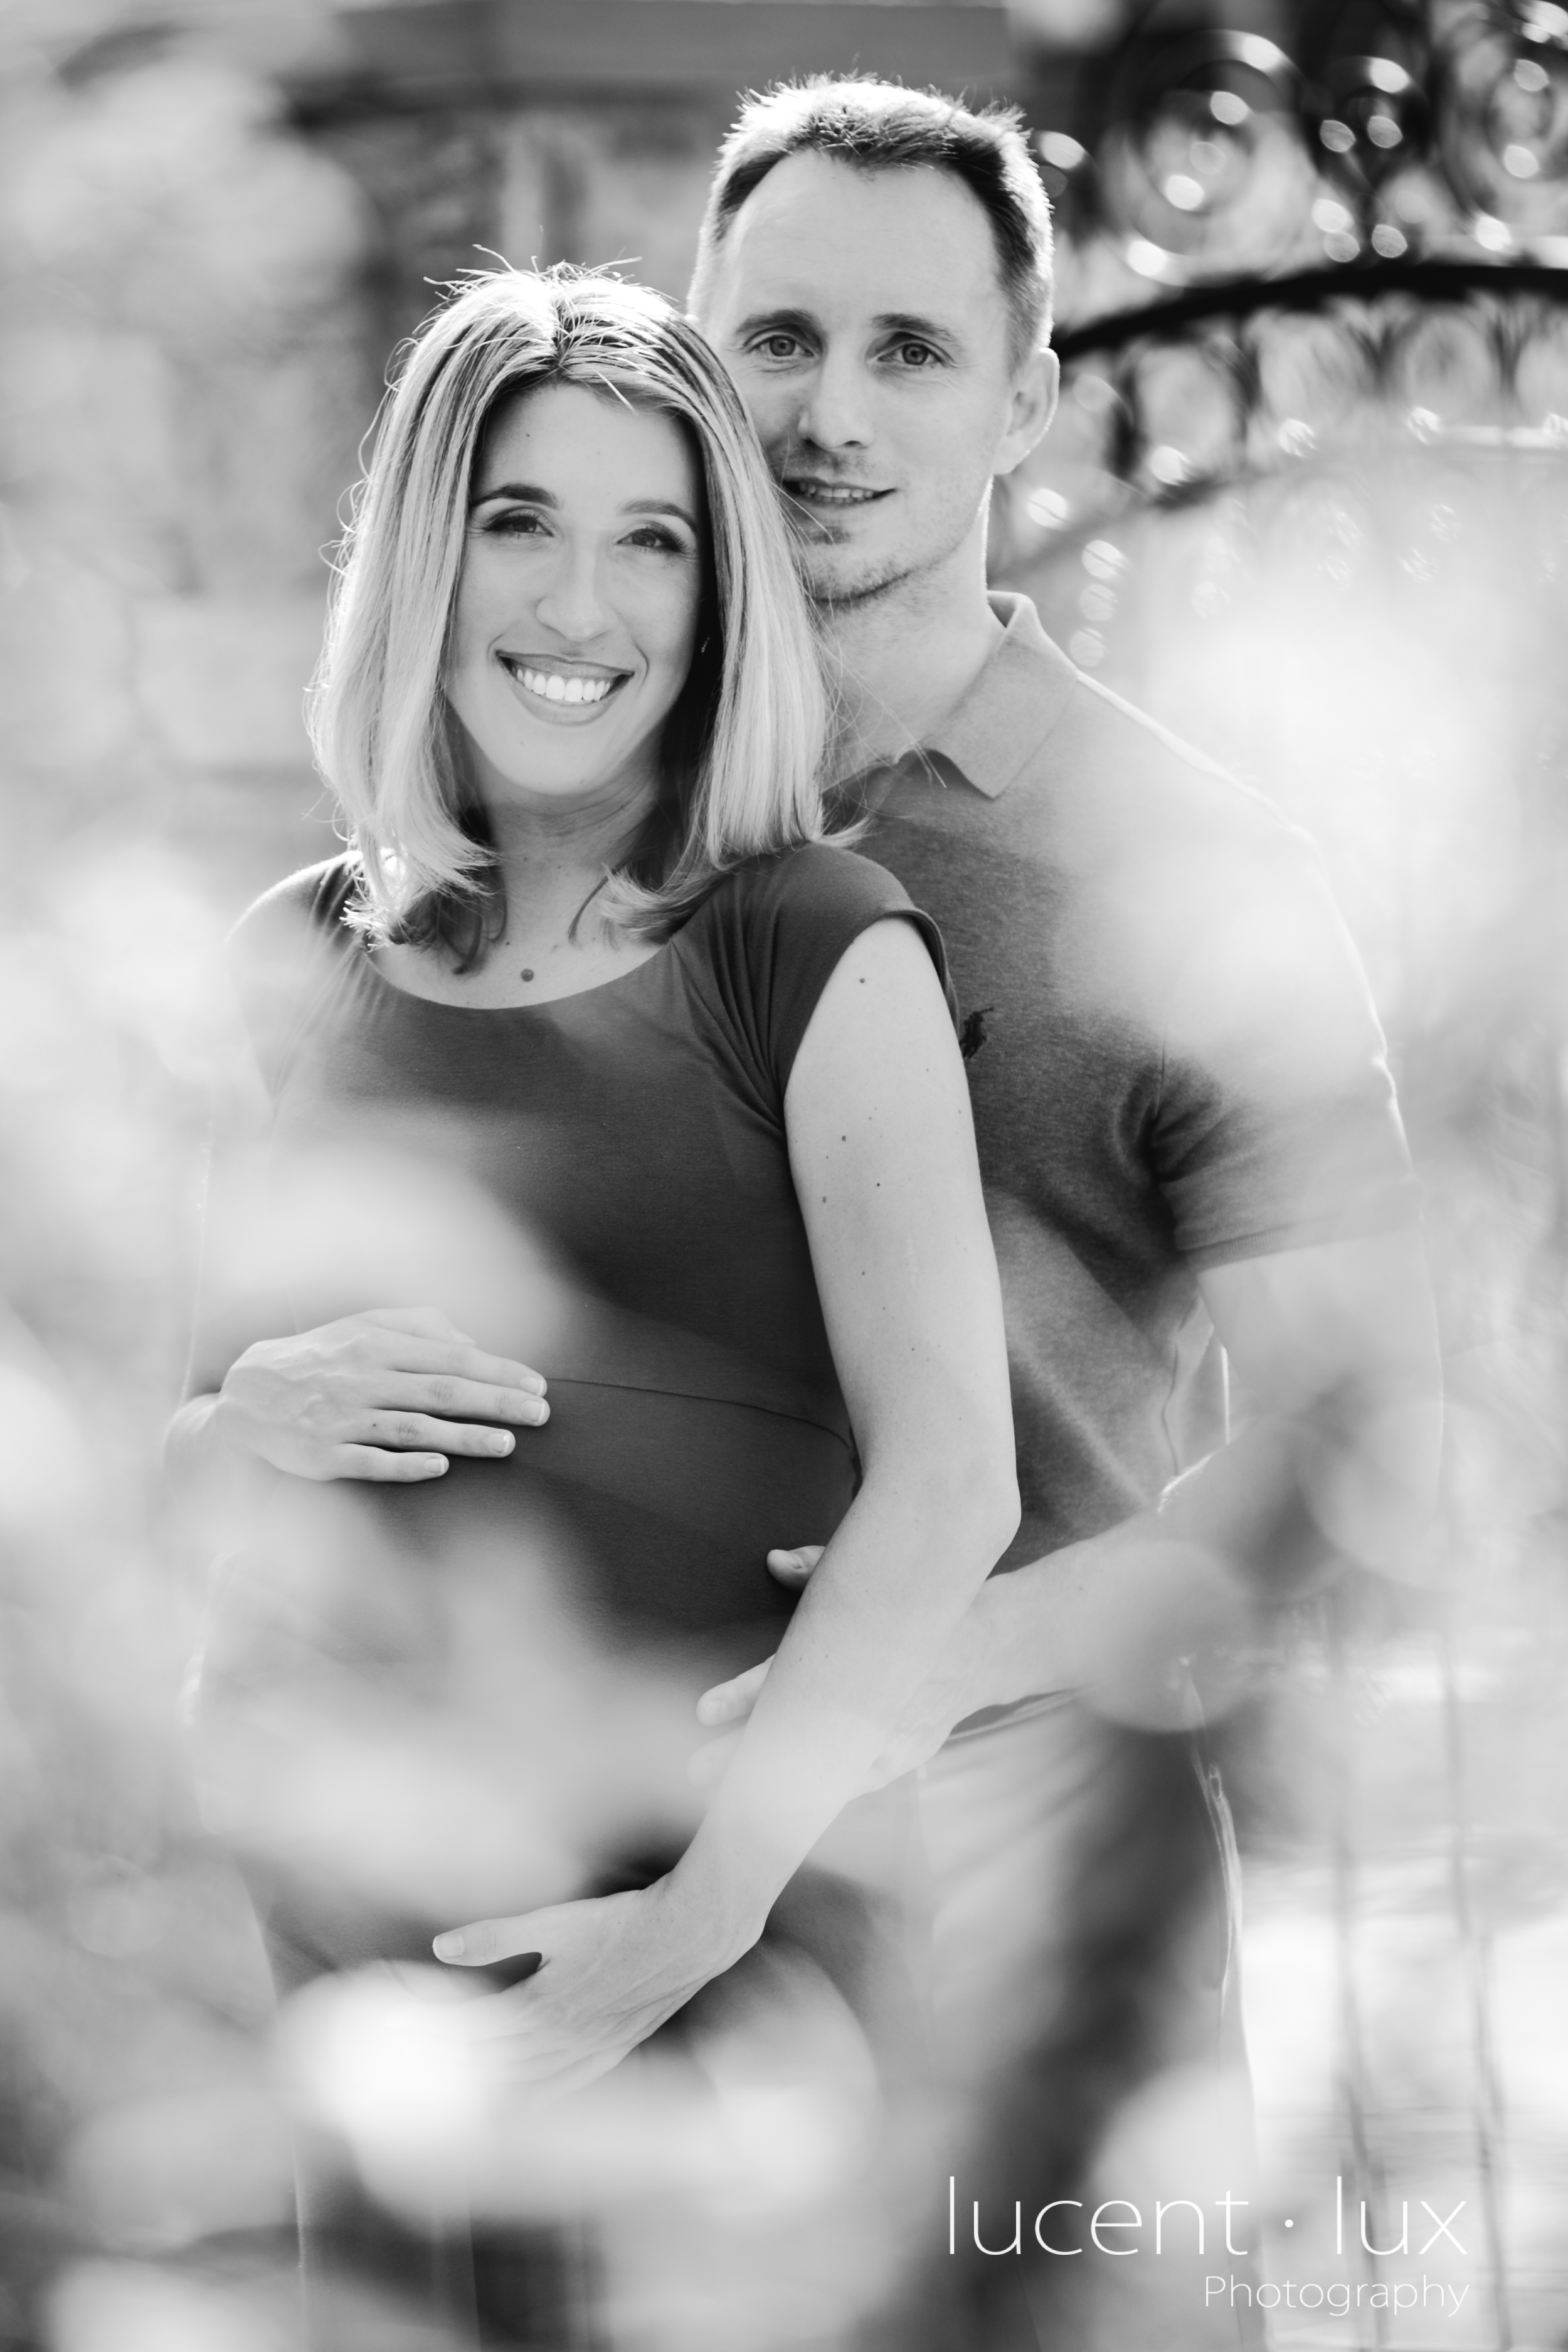 Maternity-Photography-Maryland-Baltimore-Photographer-Family-Portraits-Couple-Engagement-Newborn-100.jpg